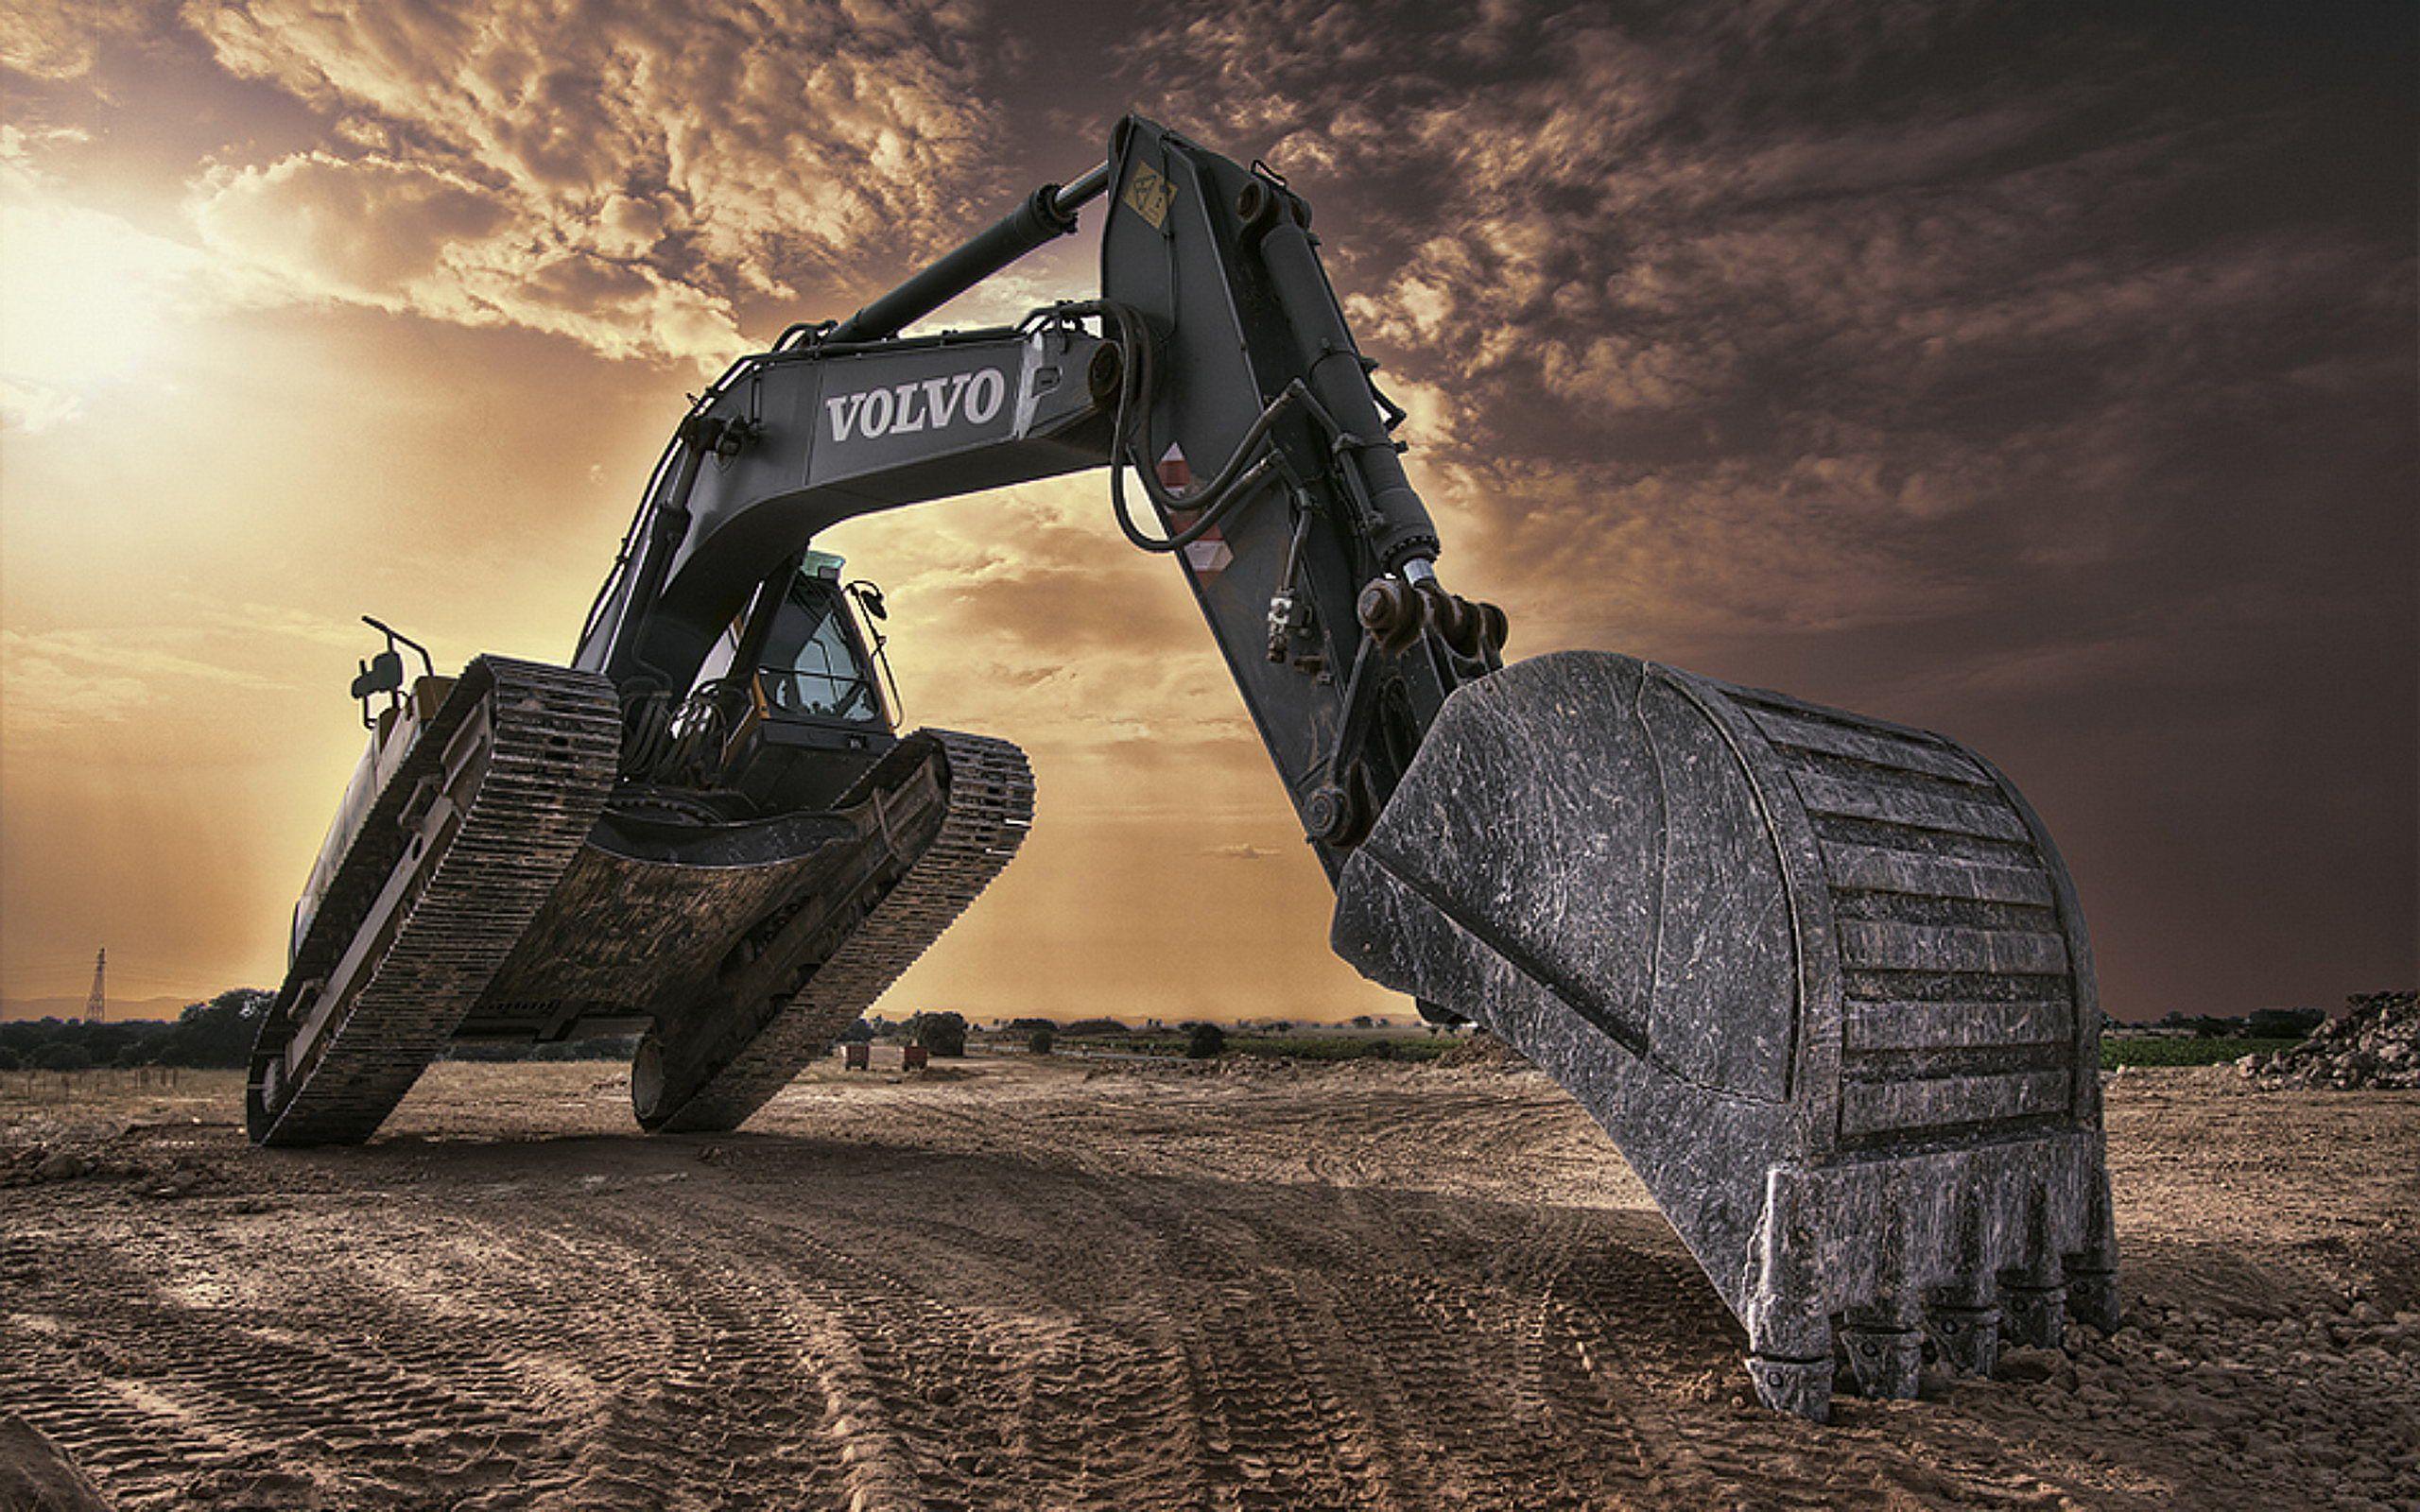 Construction Machines 2015   AllGames4ME 2014 2560x1600